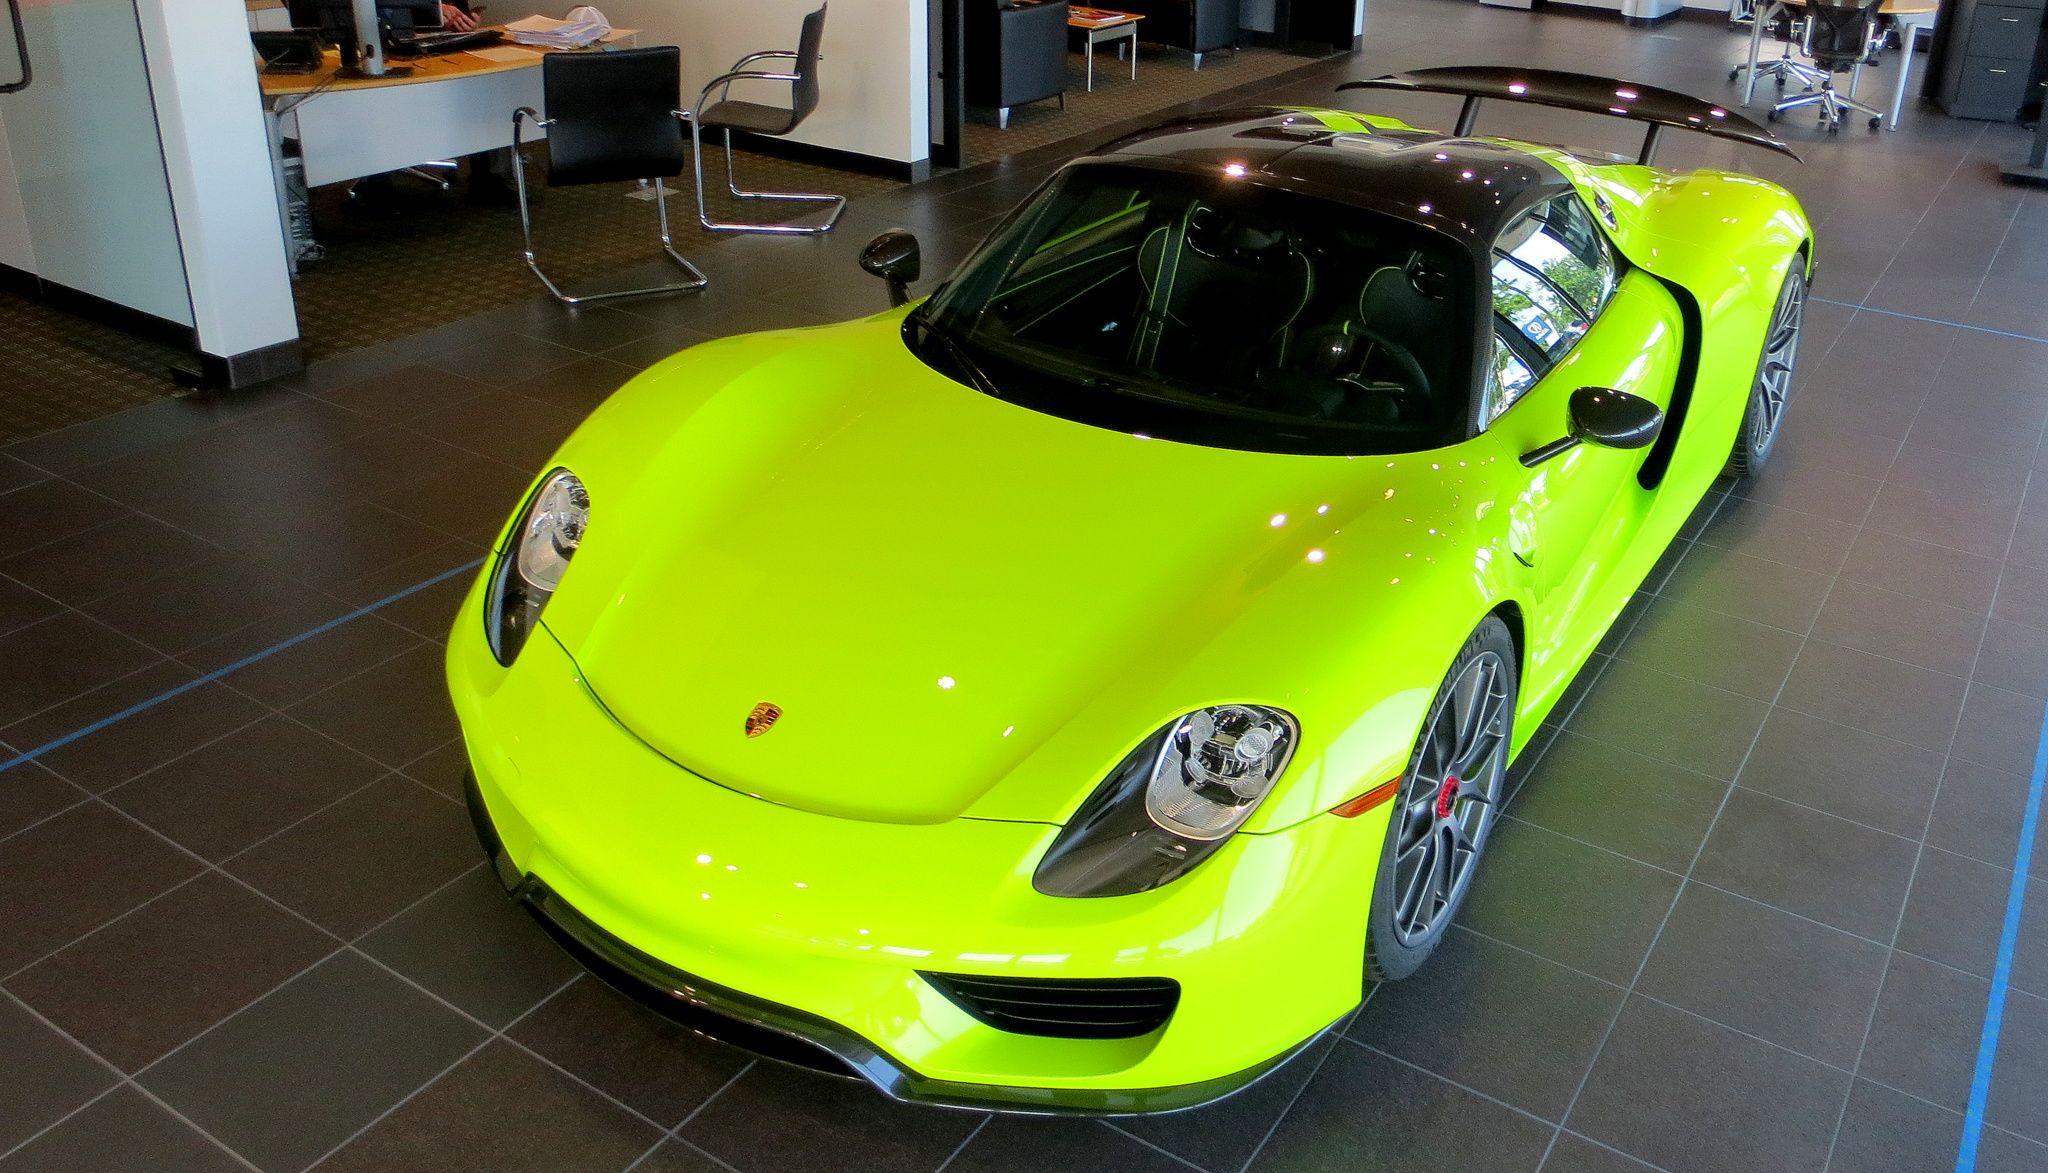 f8626674e978933ad4b5af7c8e721c93 Gorgeous Porsche 918 Spyder Acid Green Cars Trend